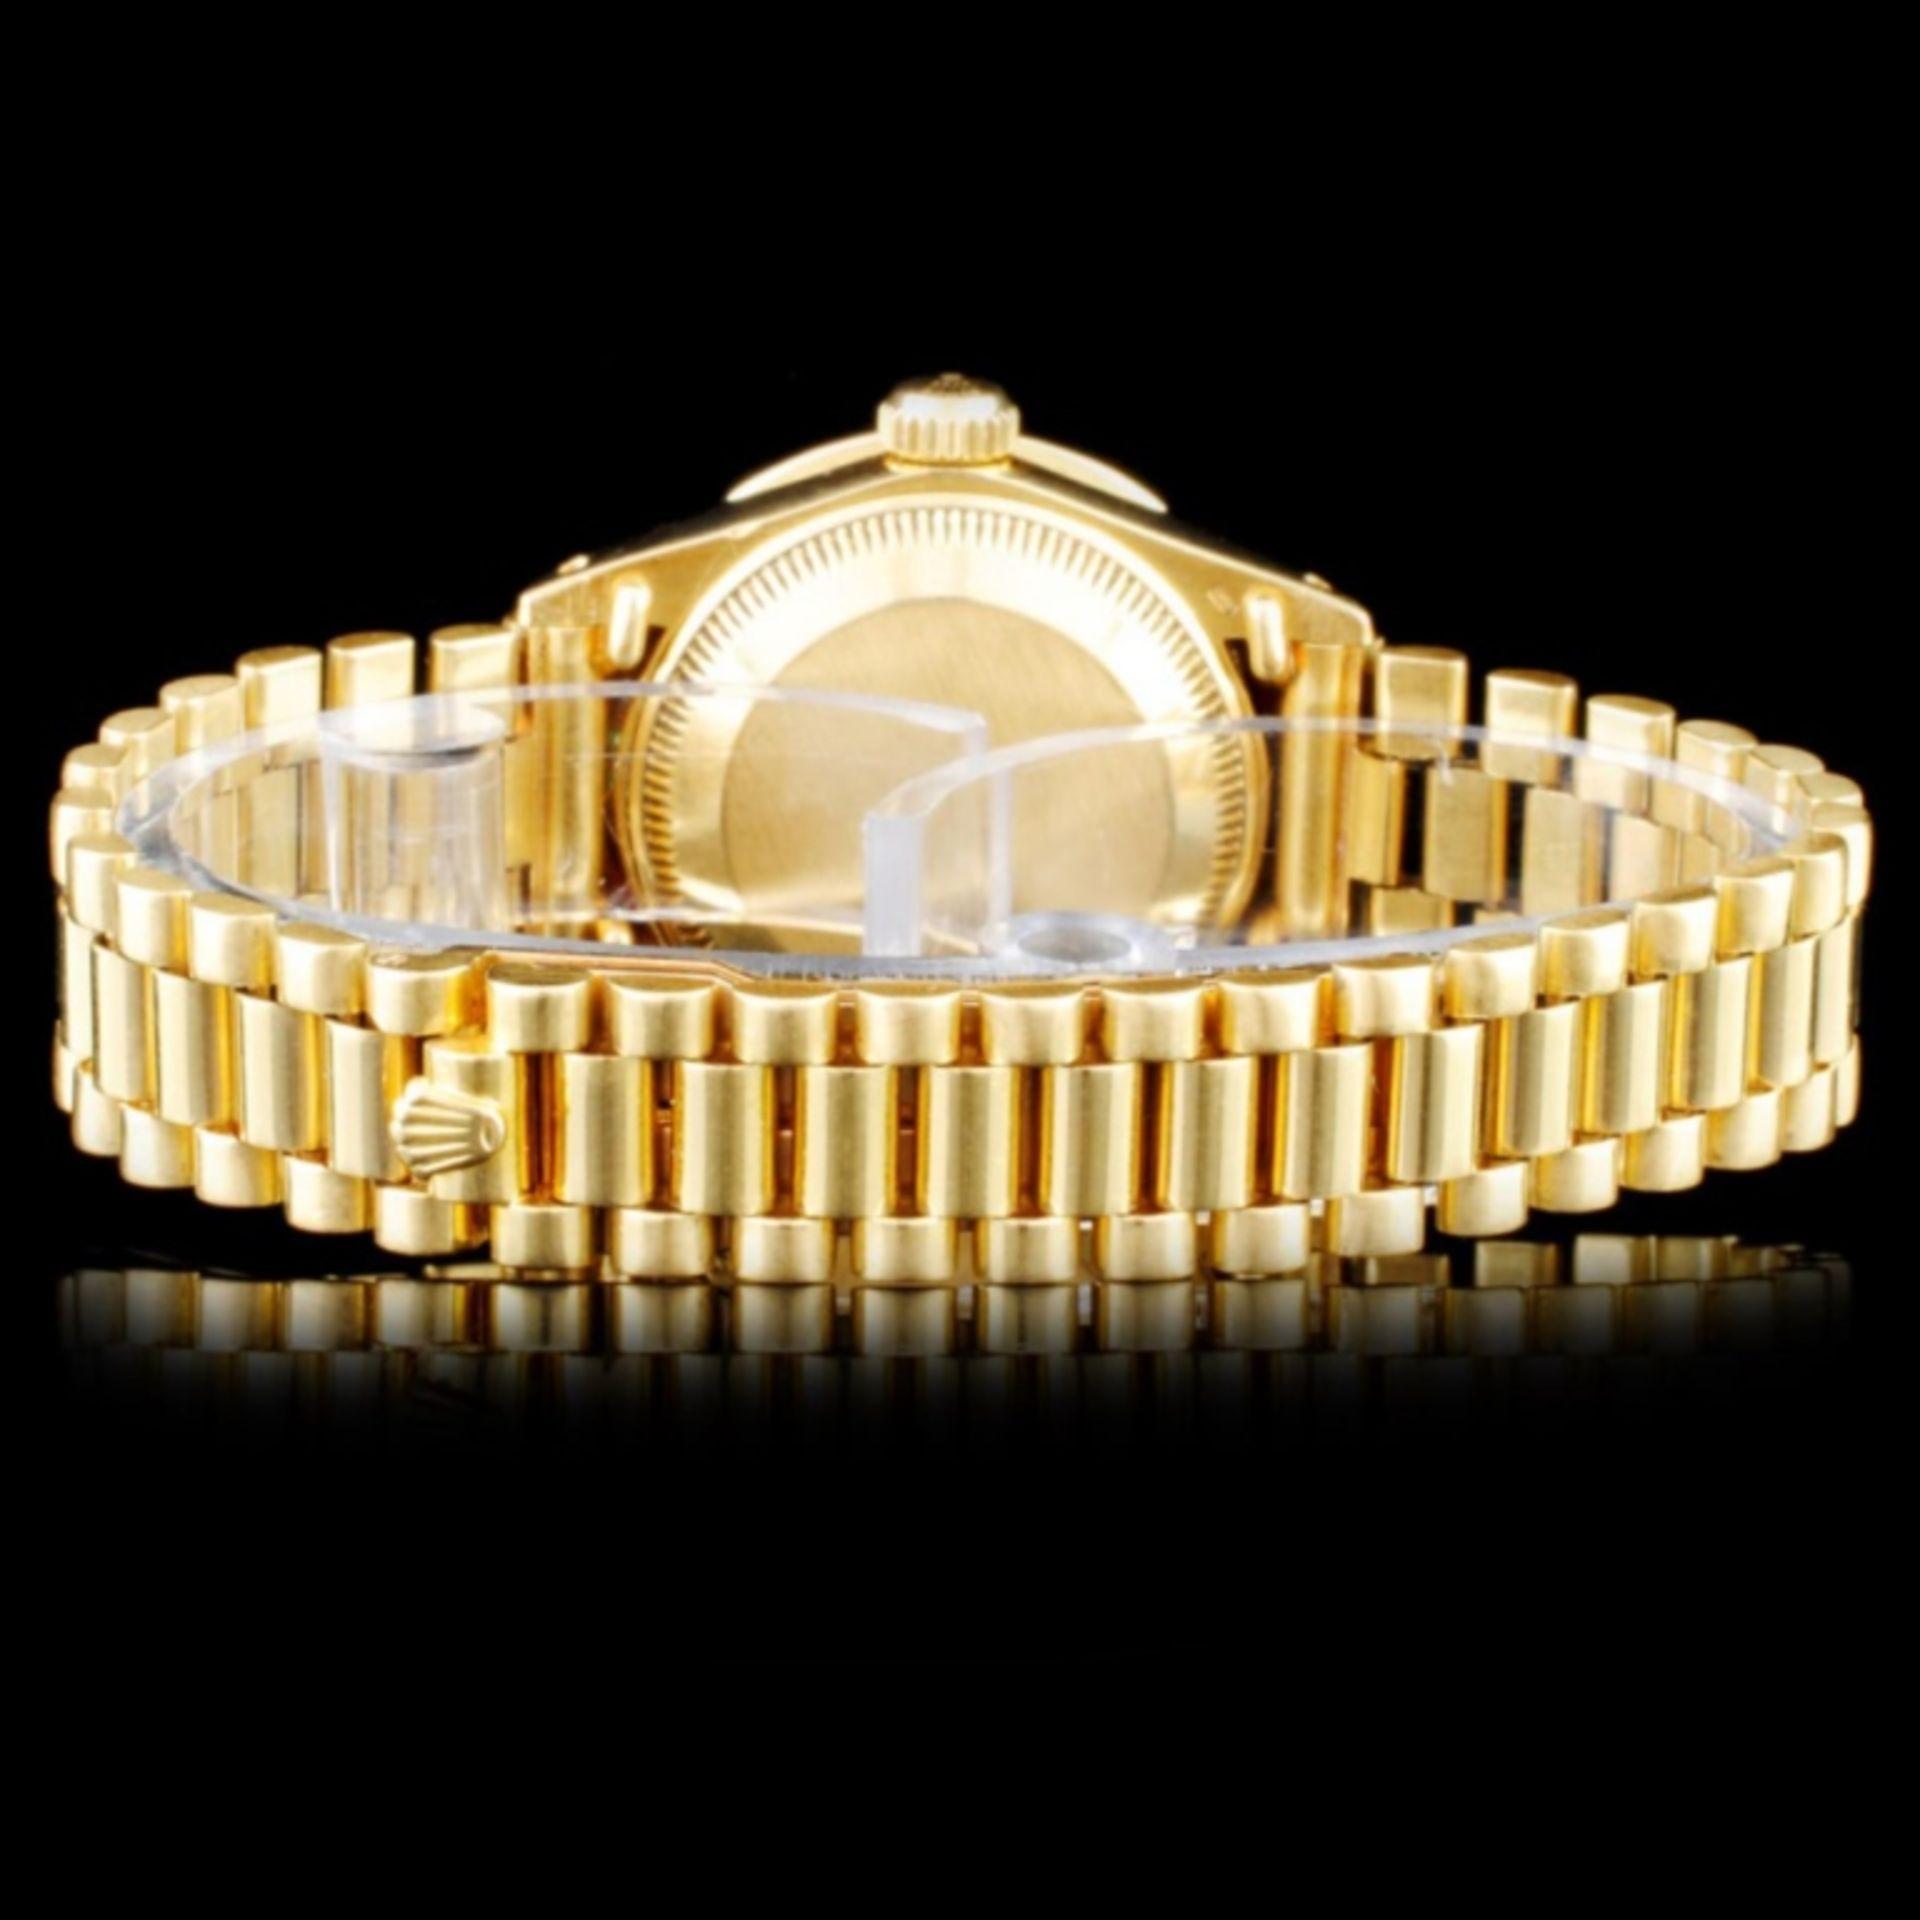 Rolex 18K Gold Presidential Ladies Wristwatch - Image 3 of 5